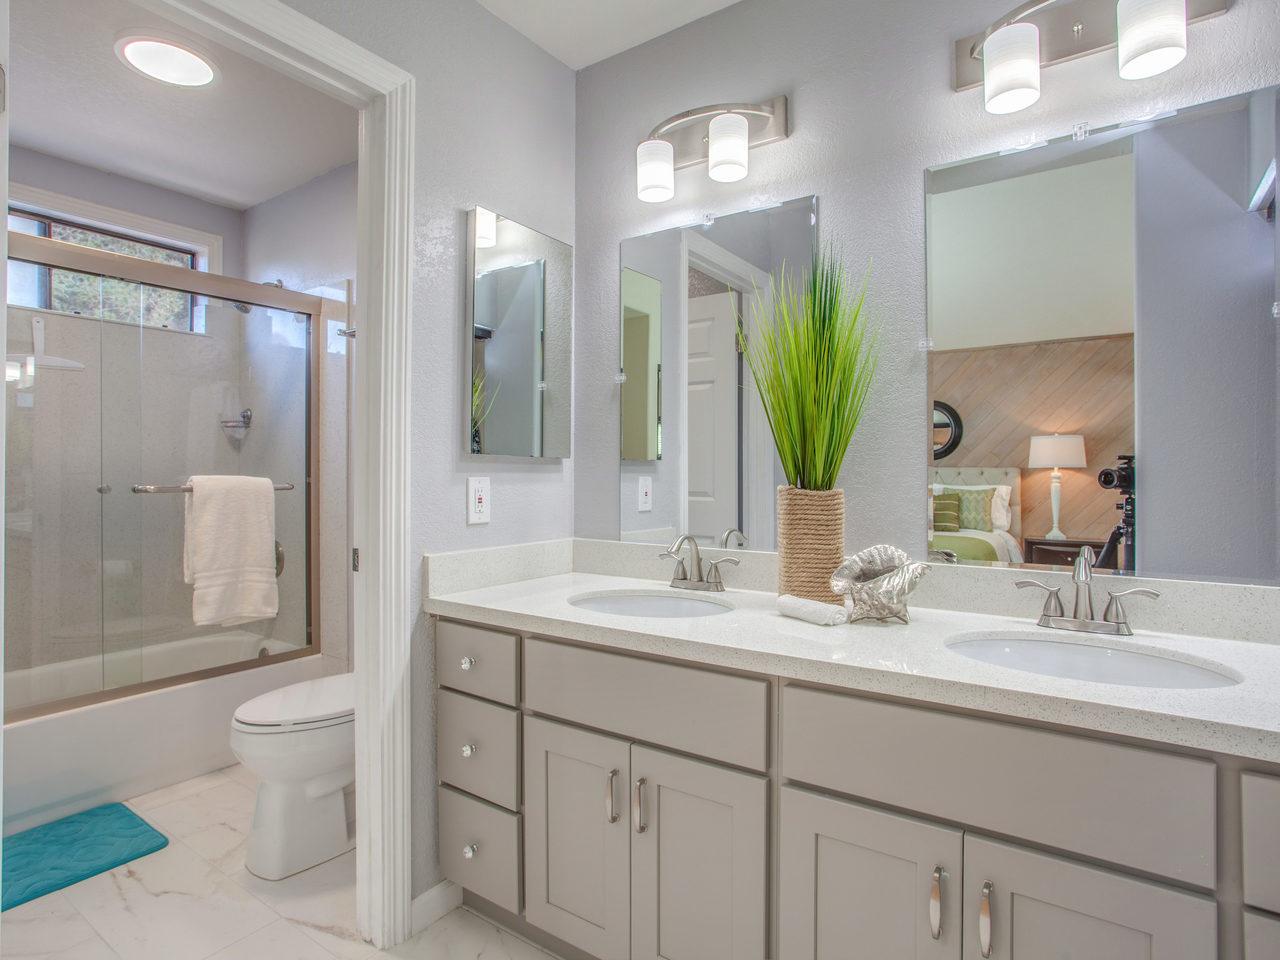 4620 Kelso St Union City CA-MLS_Size-018-10-Master Bathroom-1280x960-72dpi.jpg